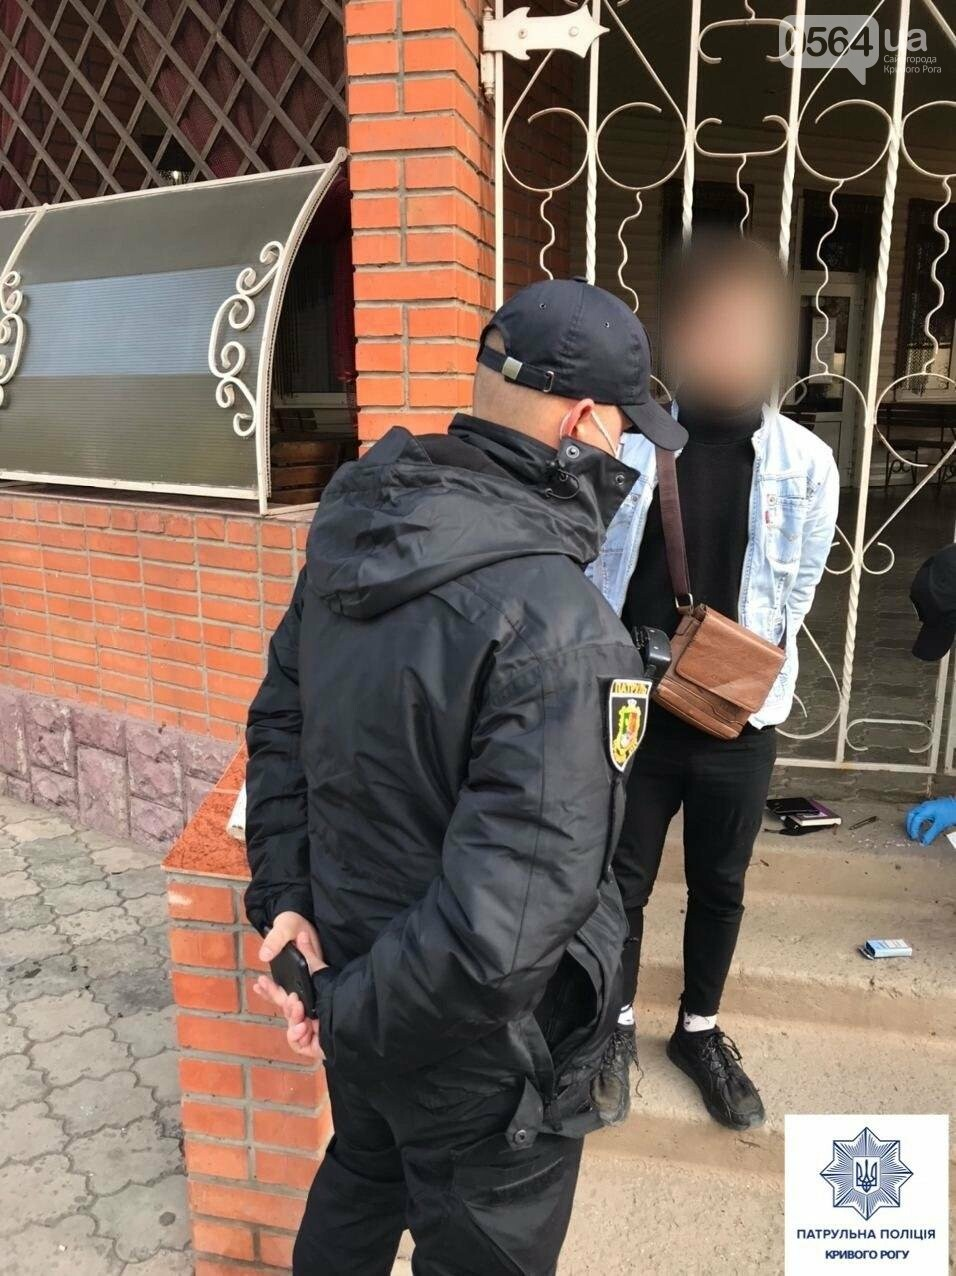 Криворожане показали копам мужчину, который хранил наркотики, - ФОТО, фото-2